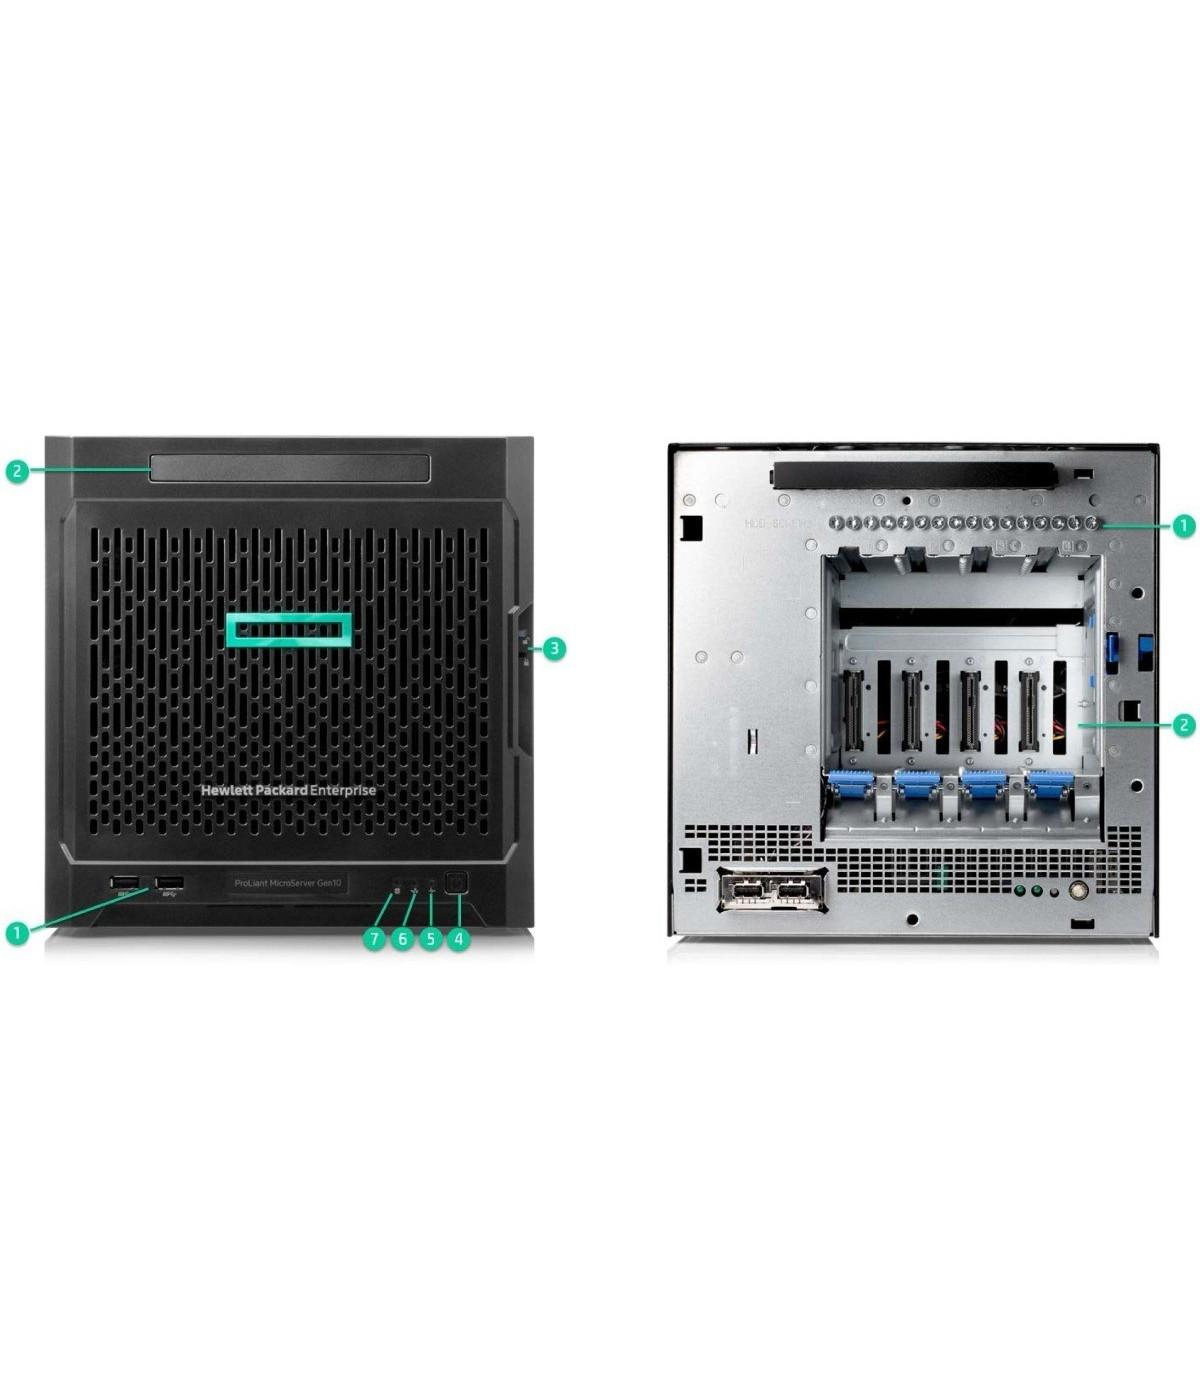 Servidor HPE Proliant Microserver Gen10